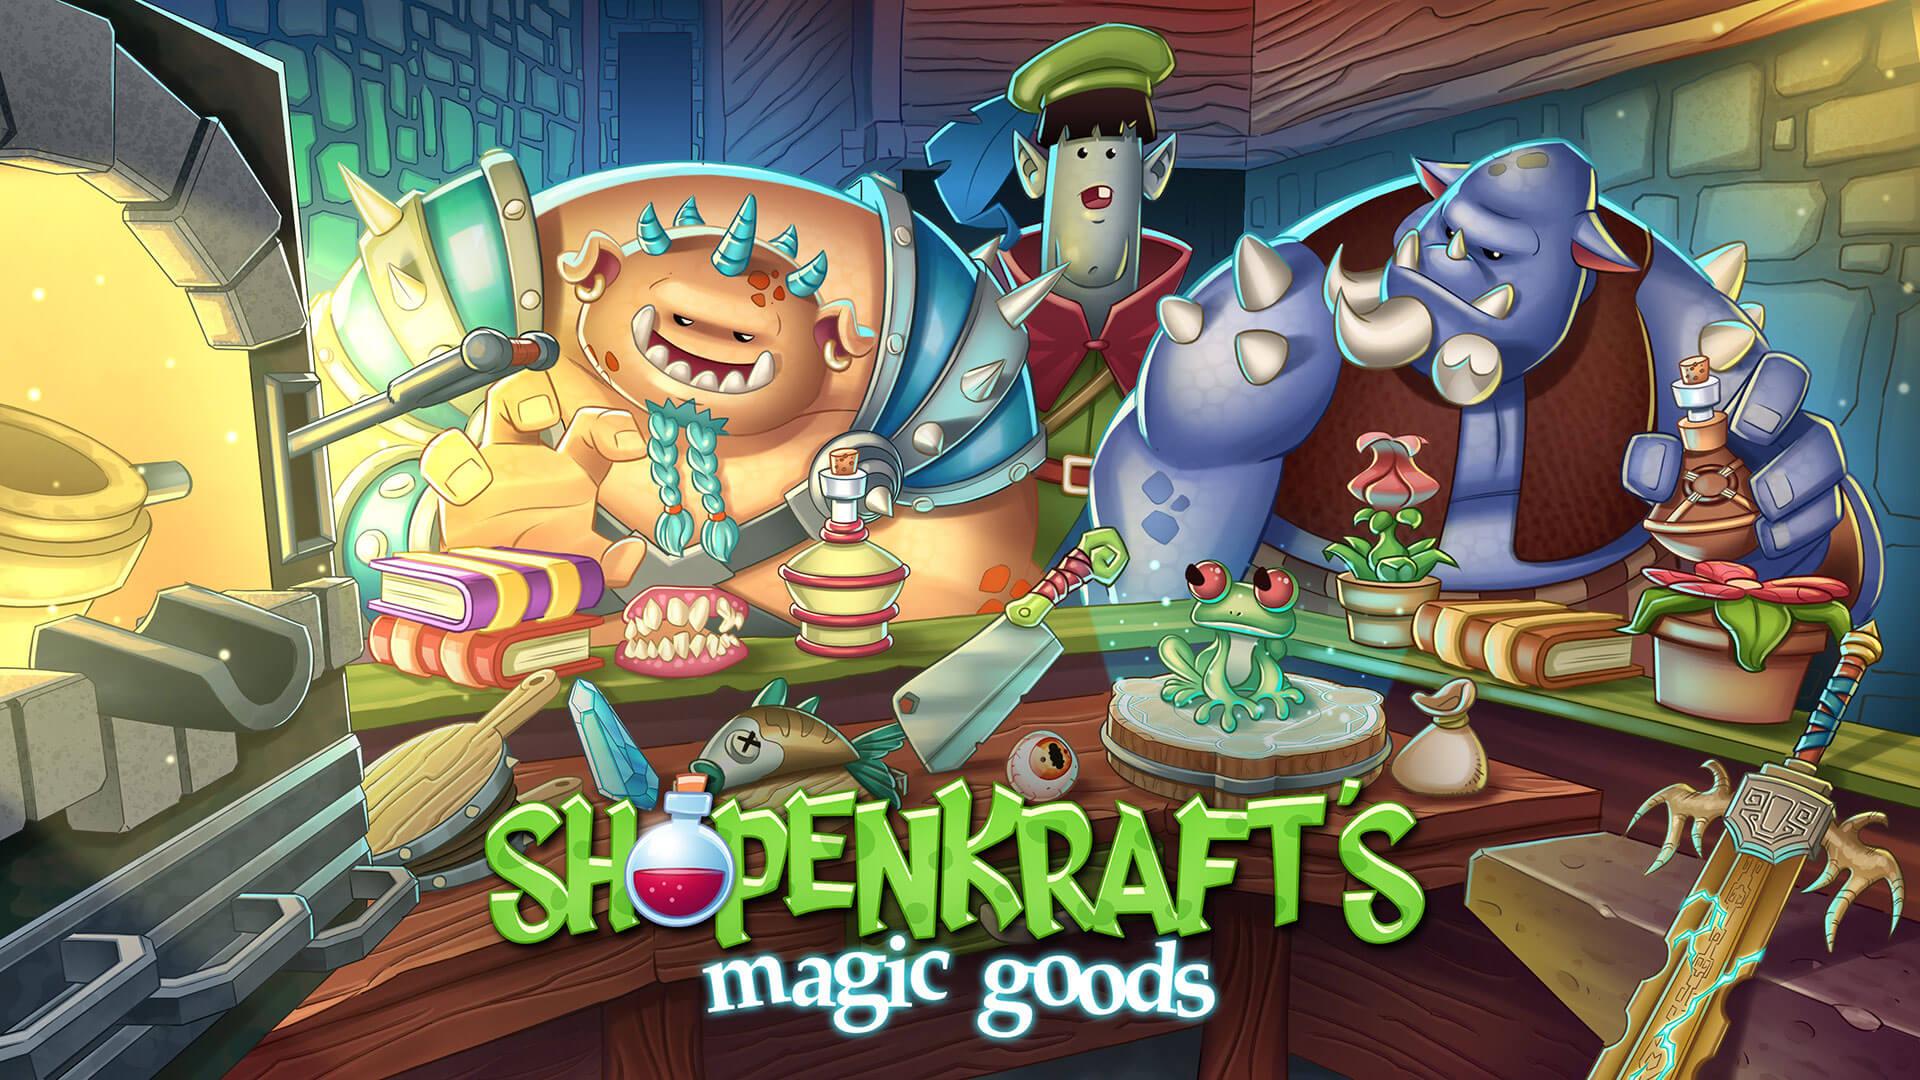 Shopenkrafts magic goods Game